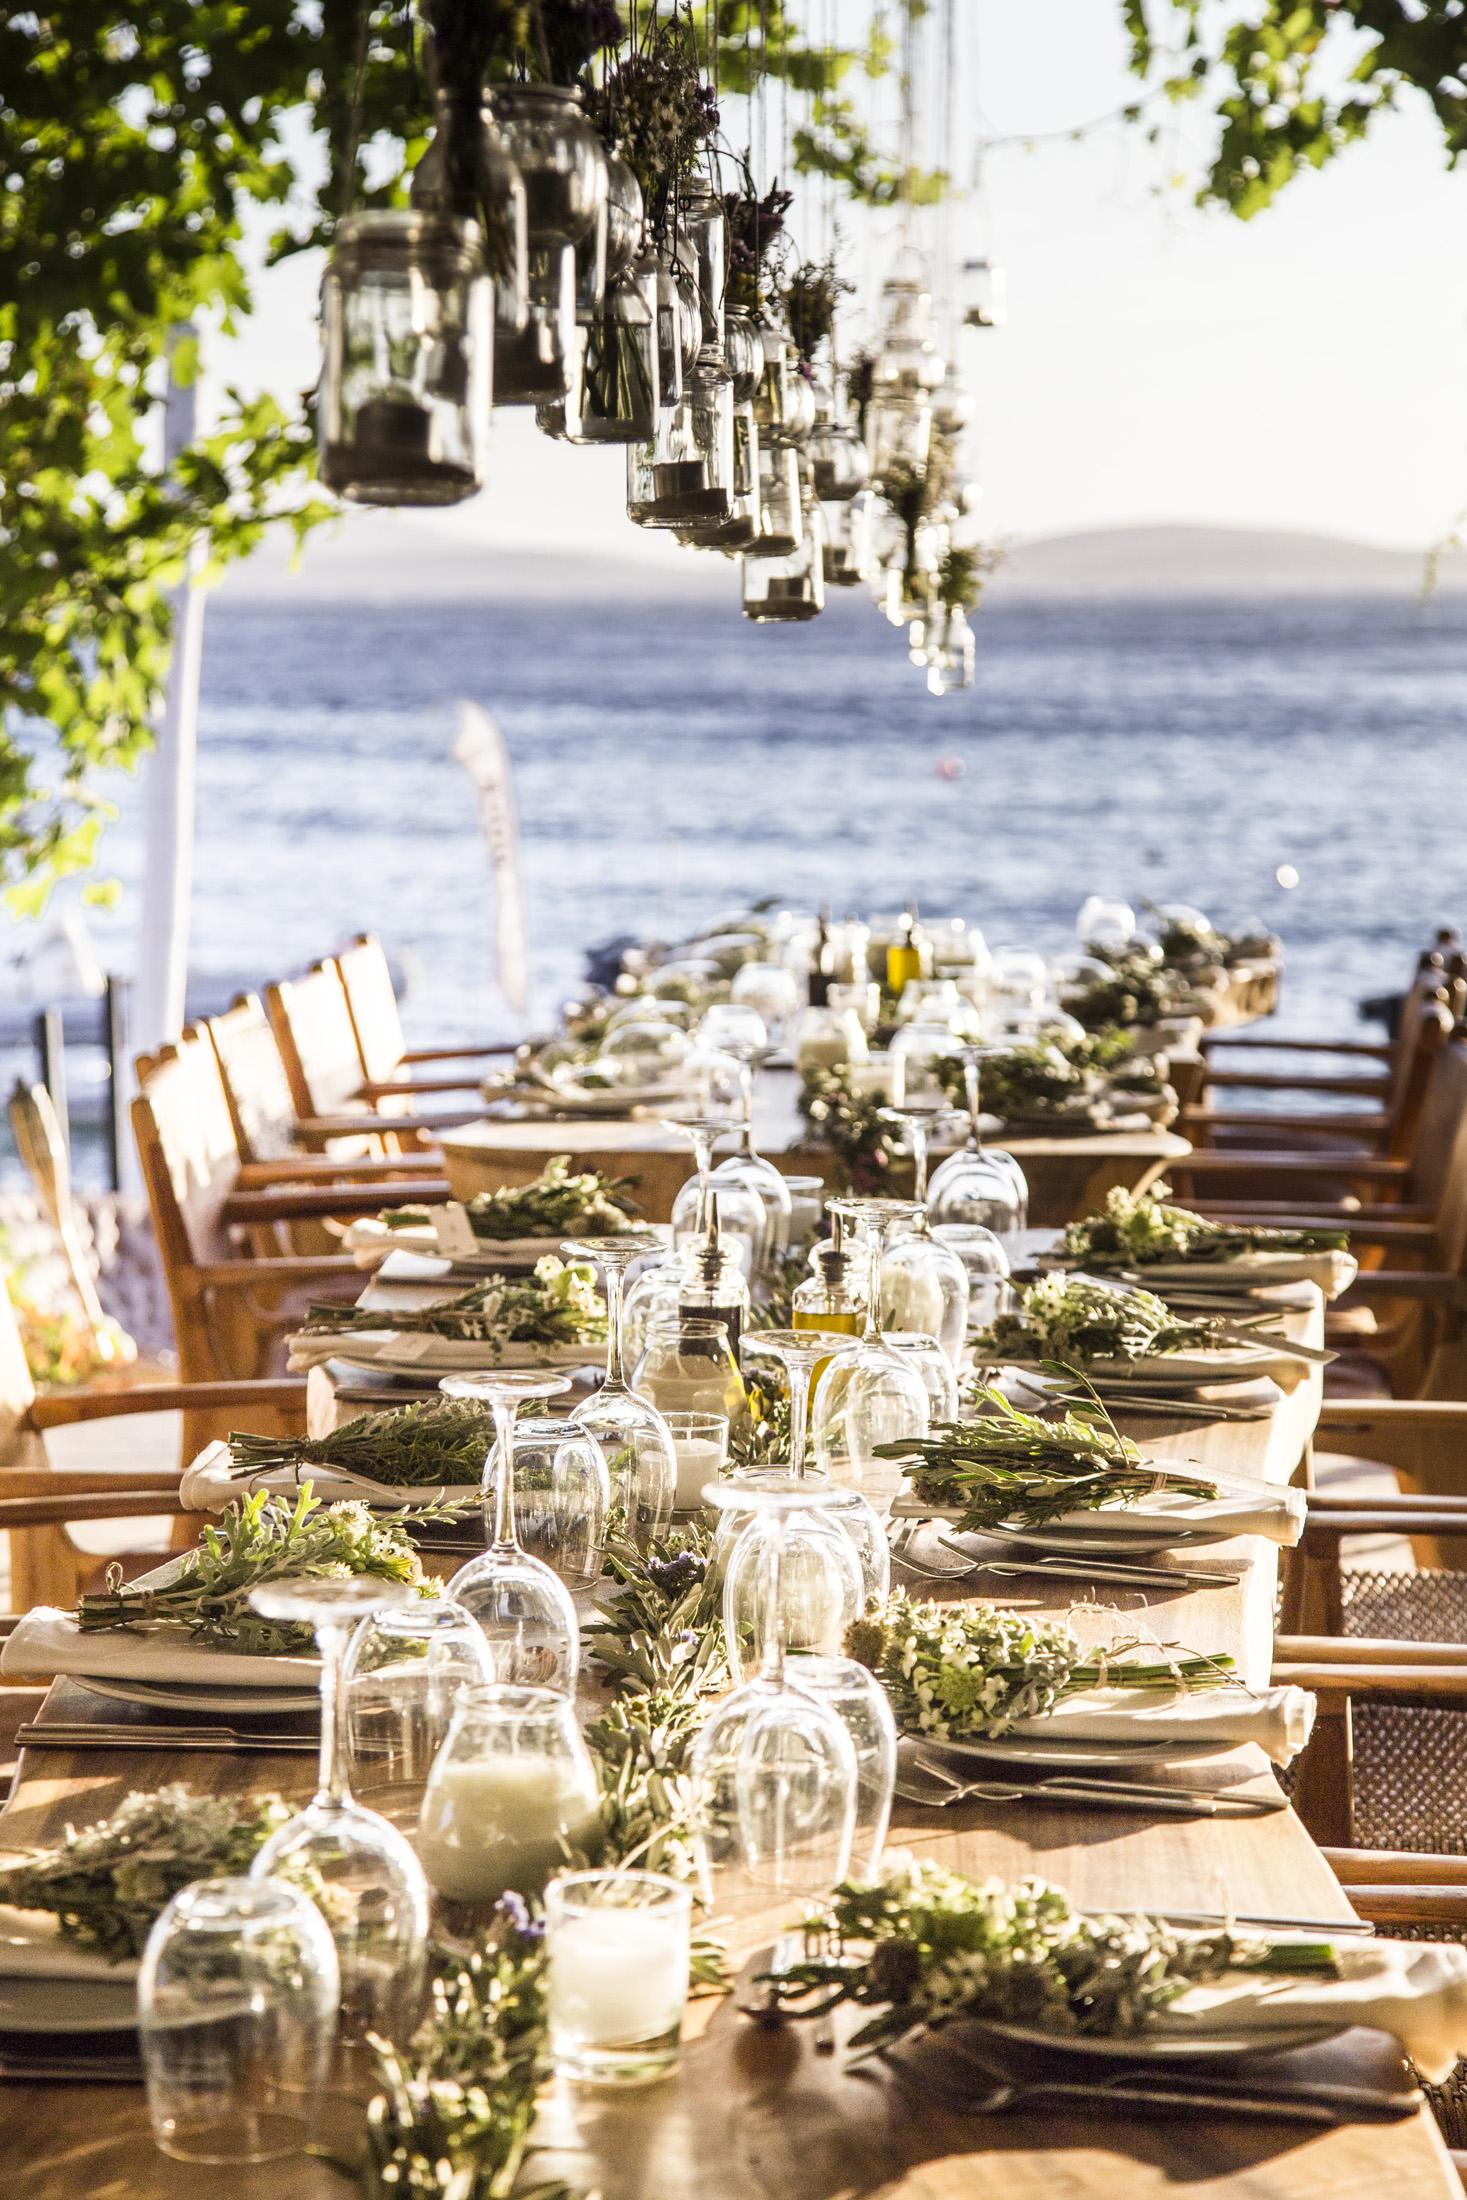 Wedding Decoration at Mykonos Island Greece